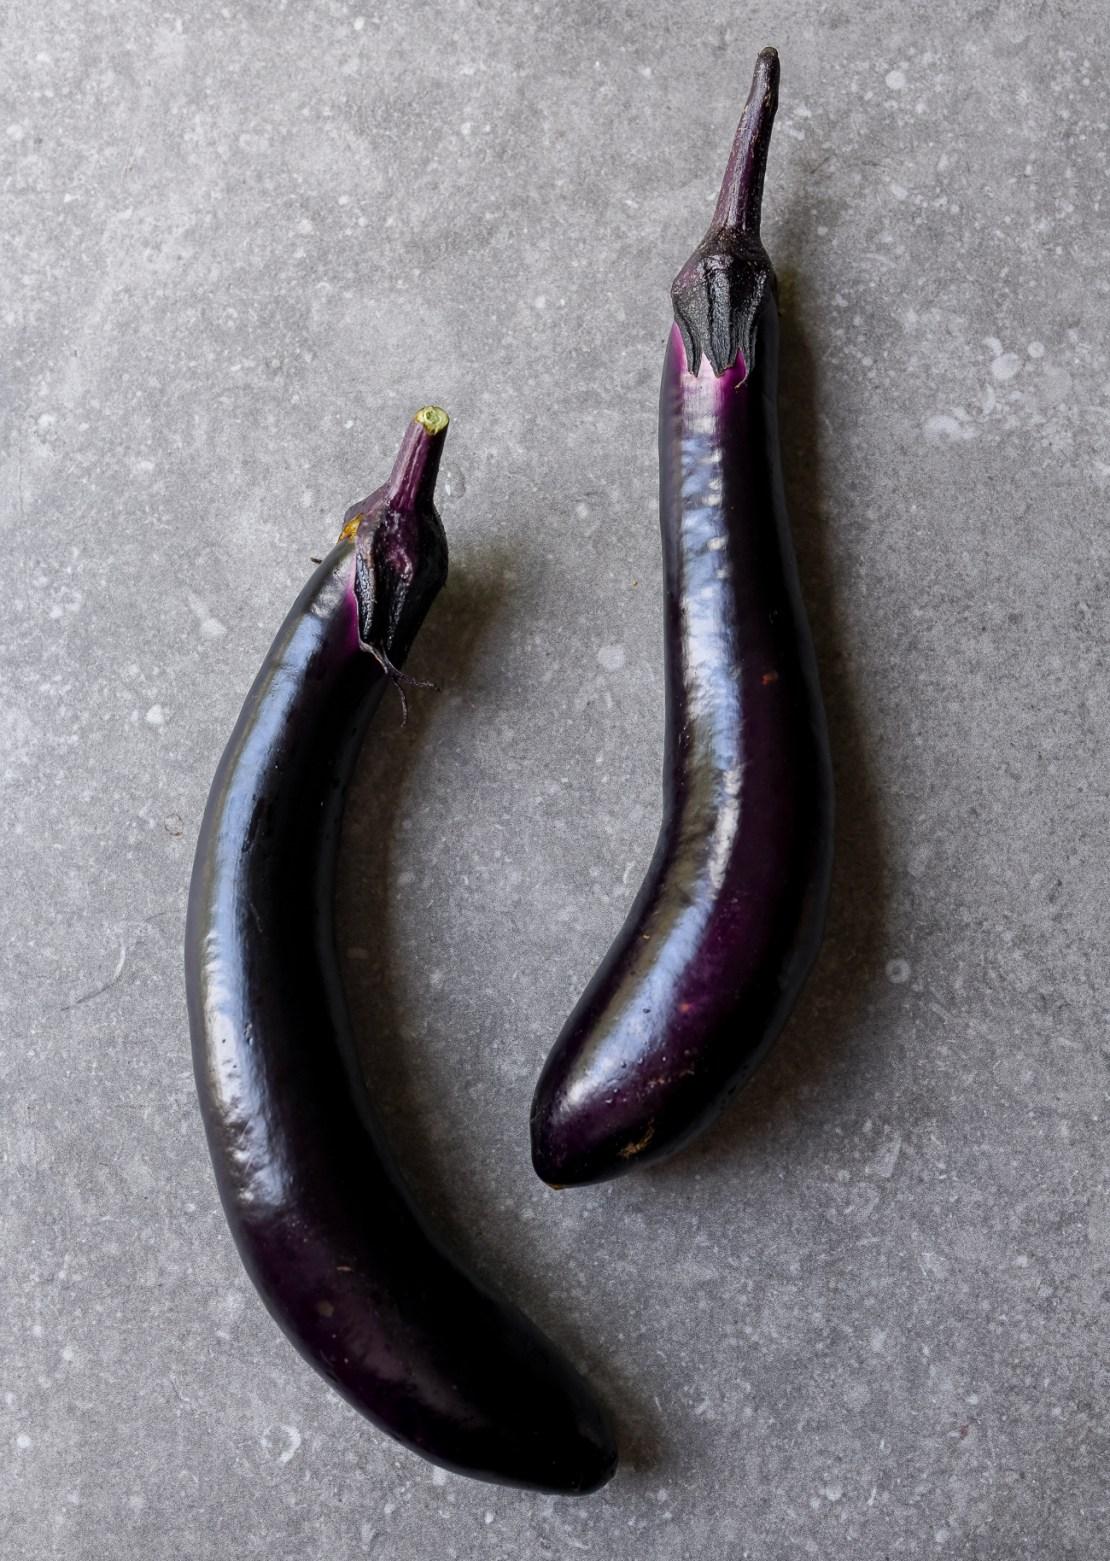 Homegrown Japanese eggplants